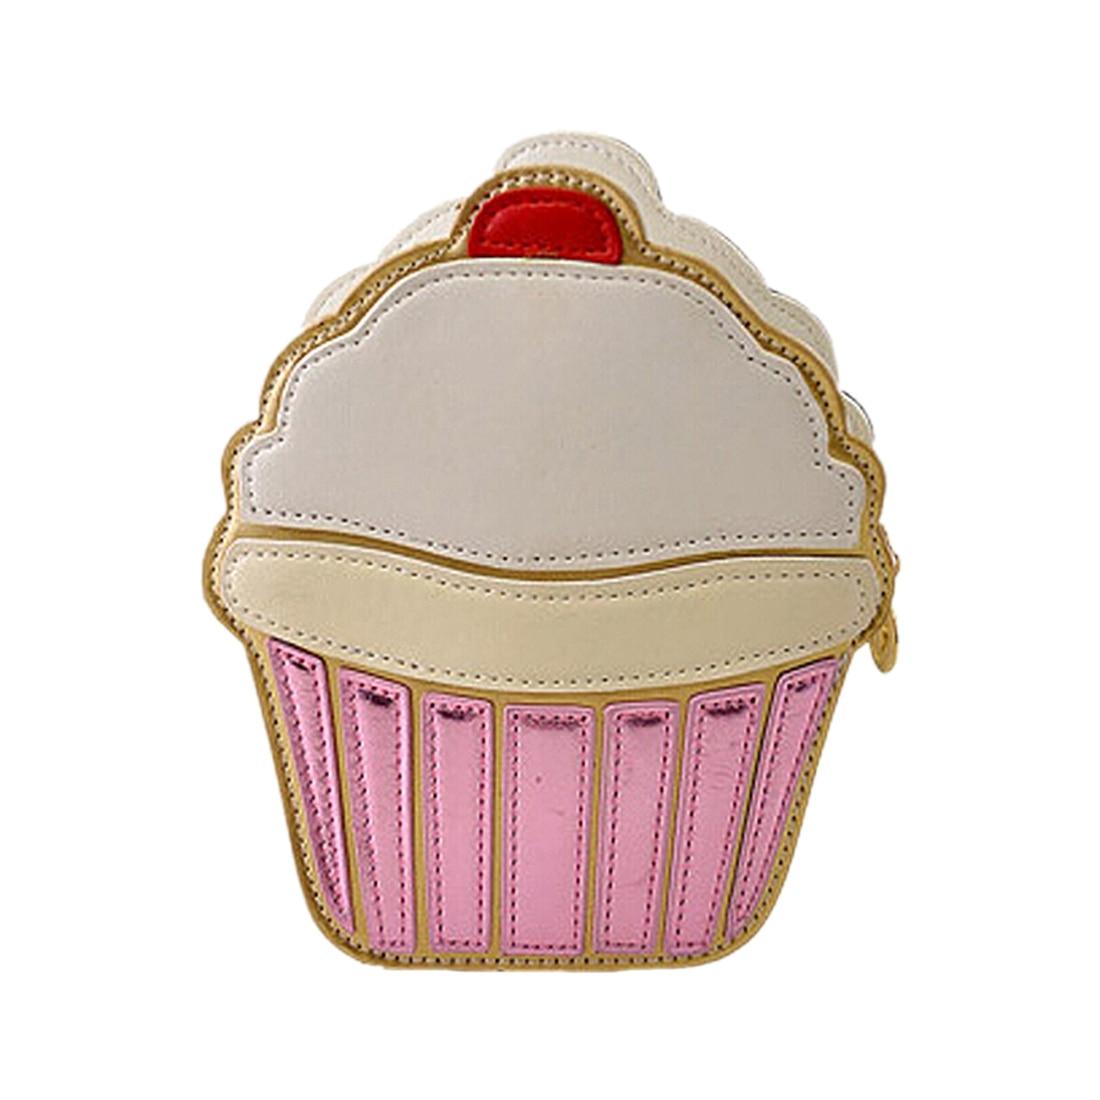 Women Ice cream Cupcake Mini Bags New Cute Cartoon PU Leather Small Chain Clutch Crossbody Girl Shoulder Messenger Tote bag Sac